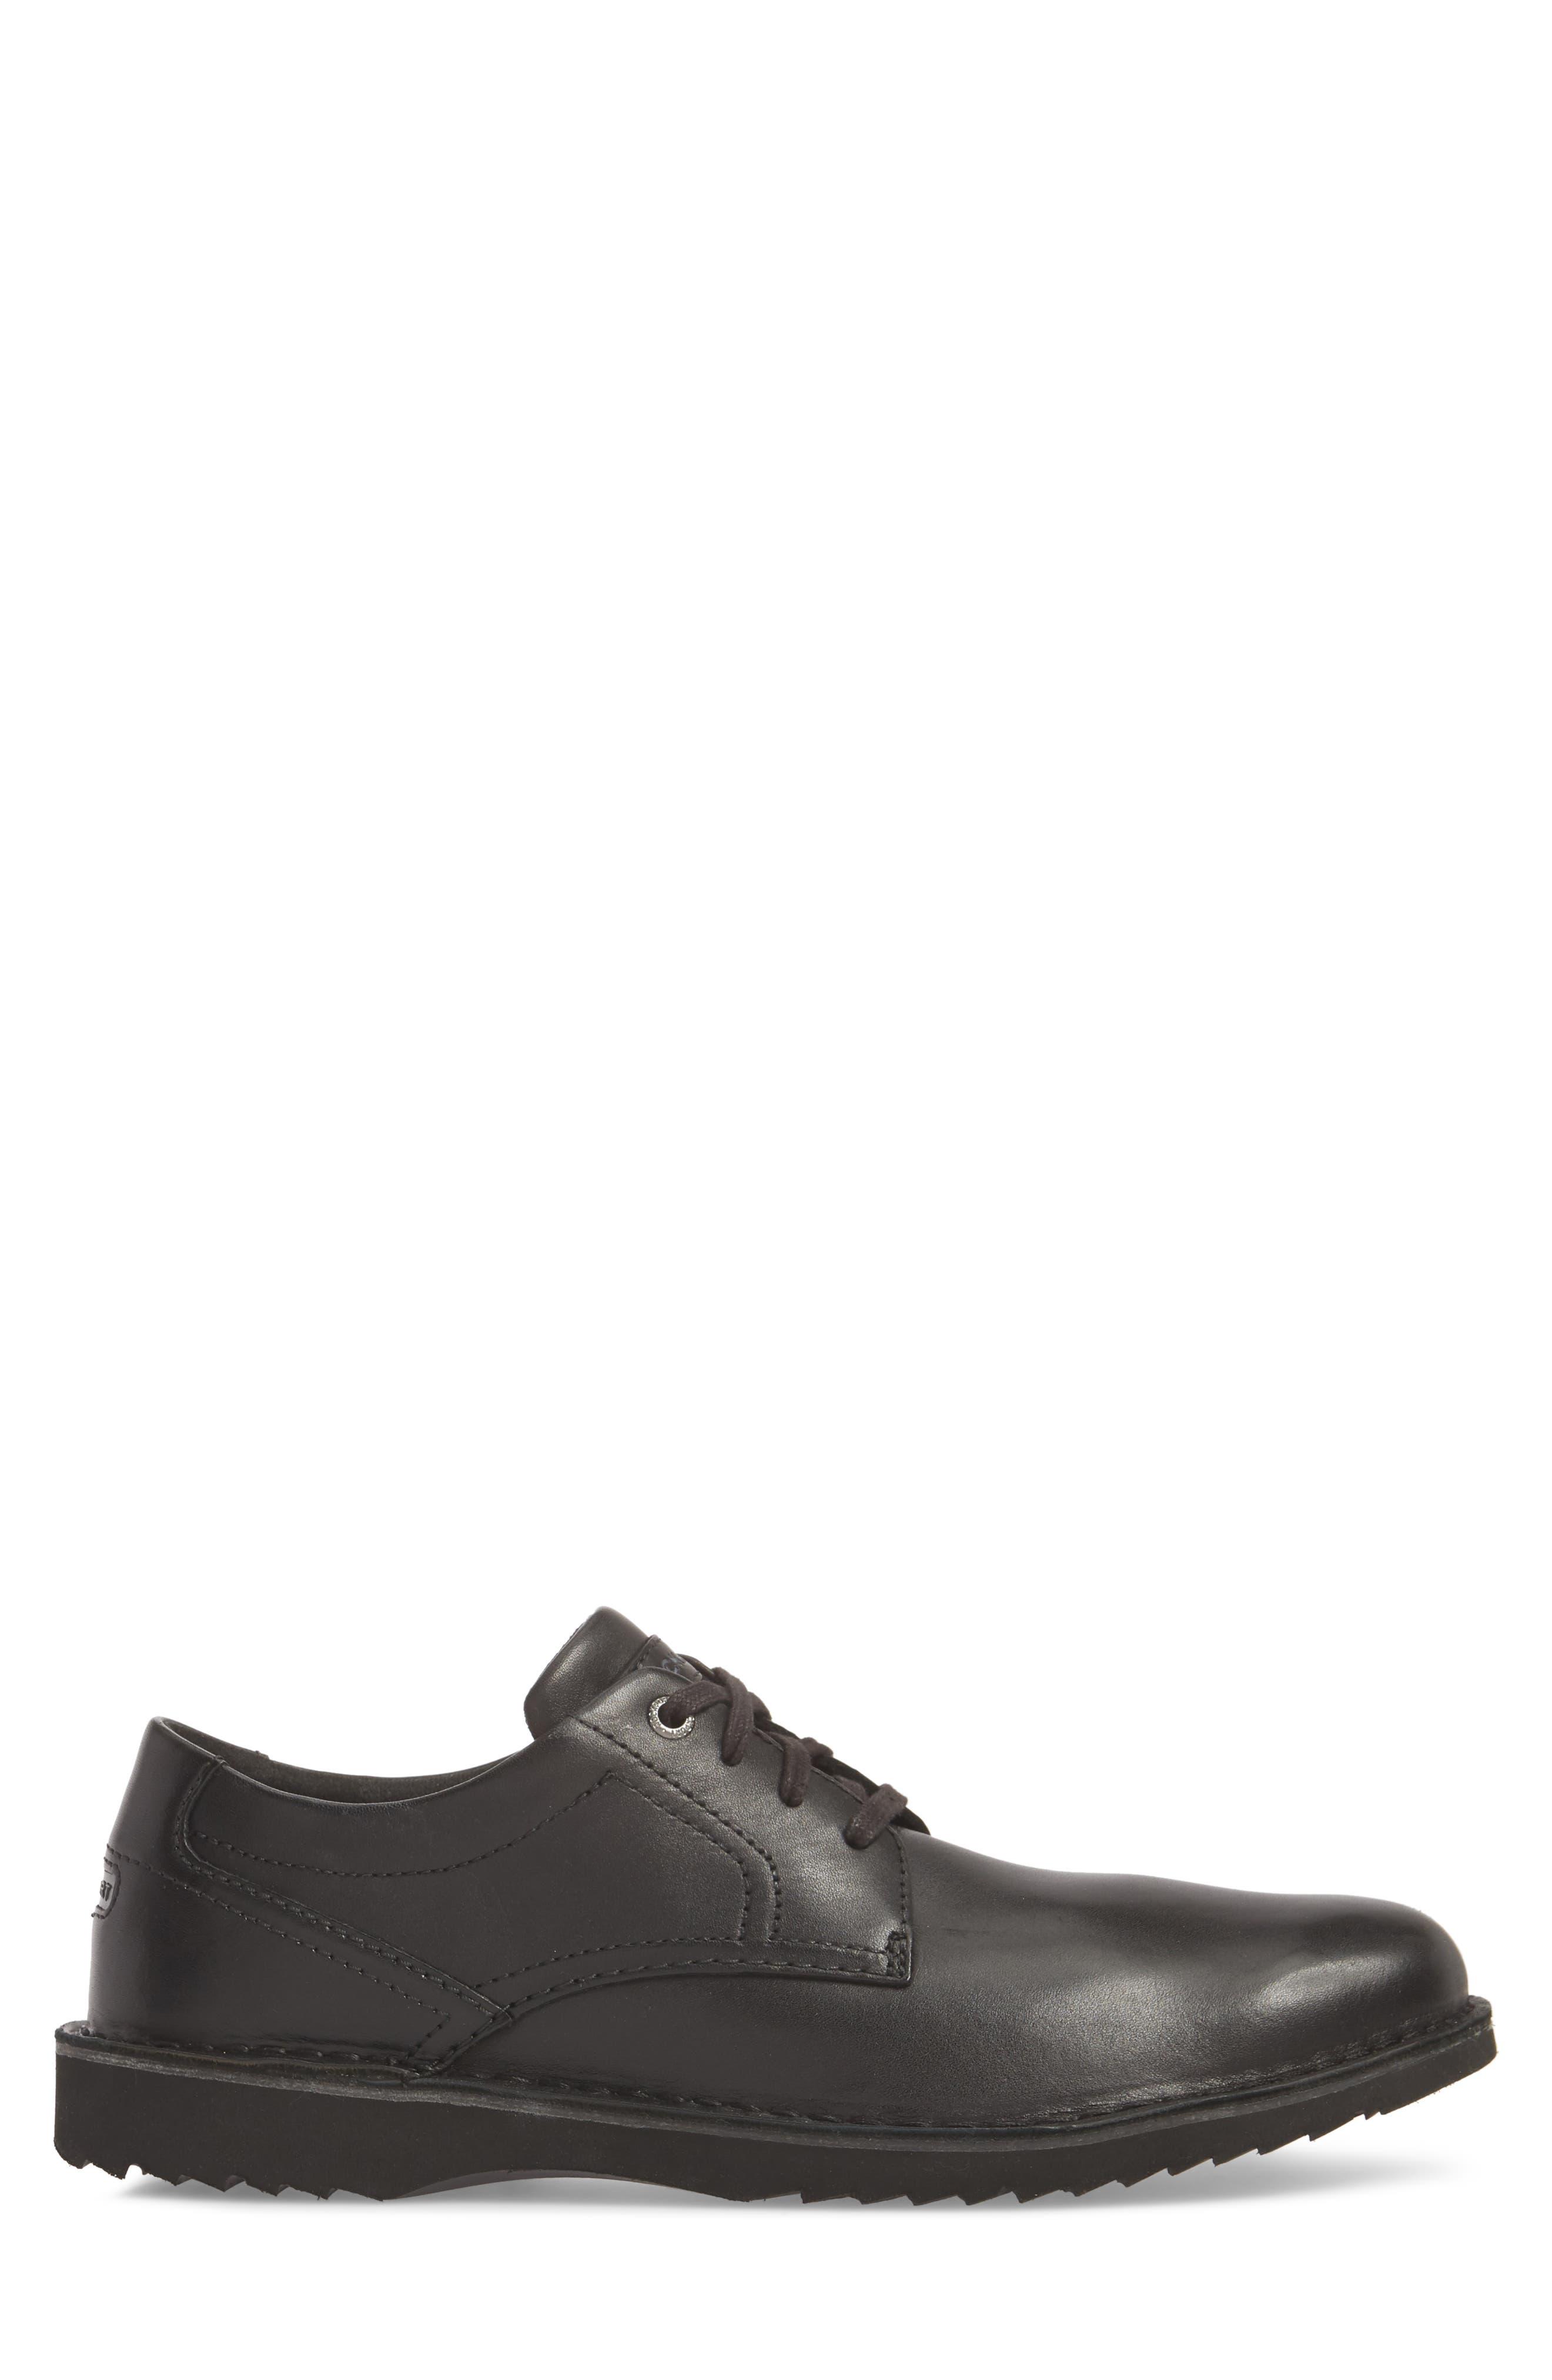 Cabot Plain Toe Derby,                             Alternate thumbnail 3, color,                             Black Leather